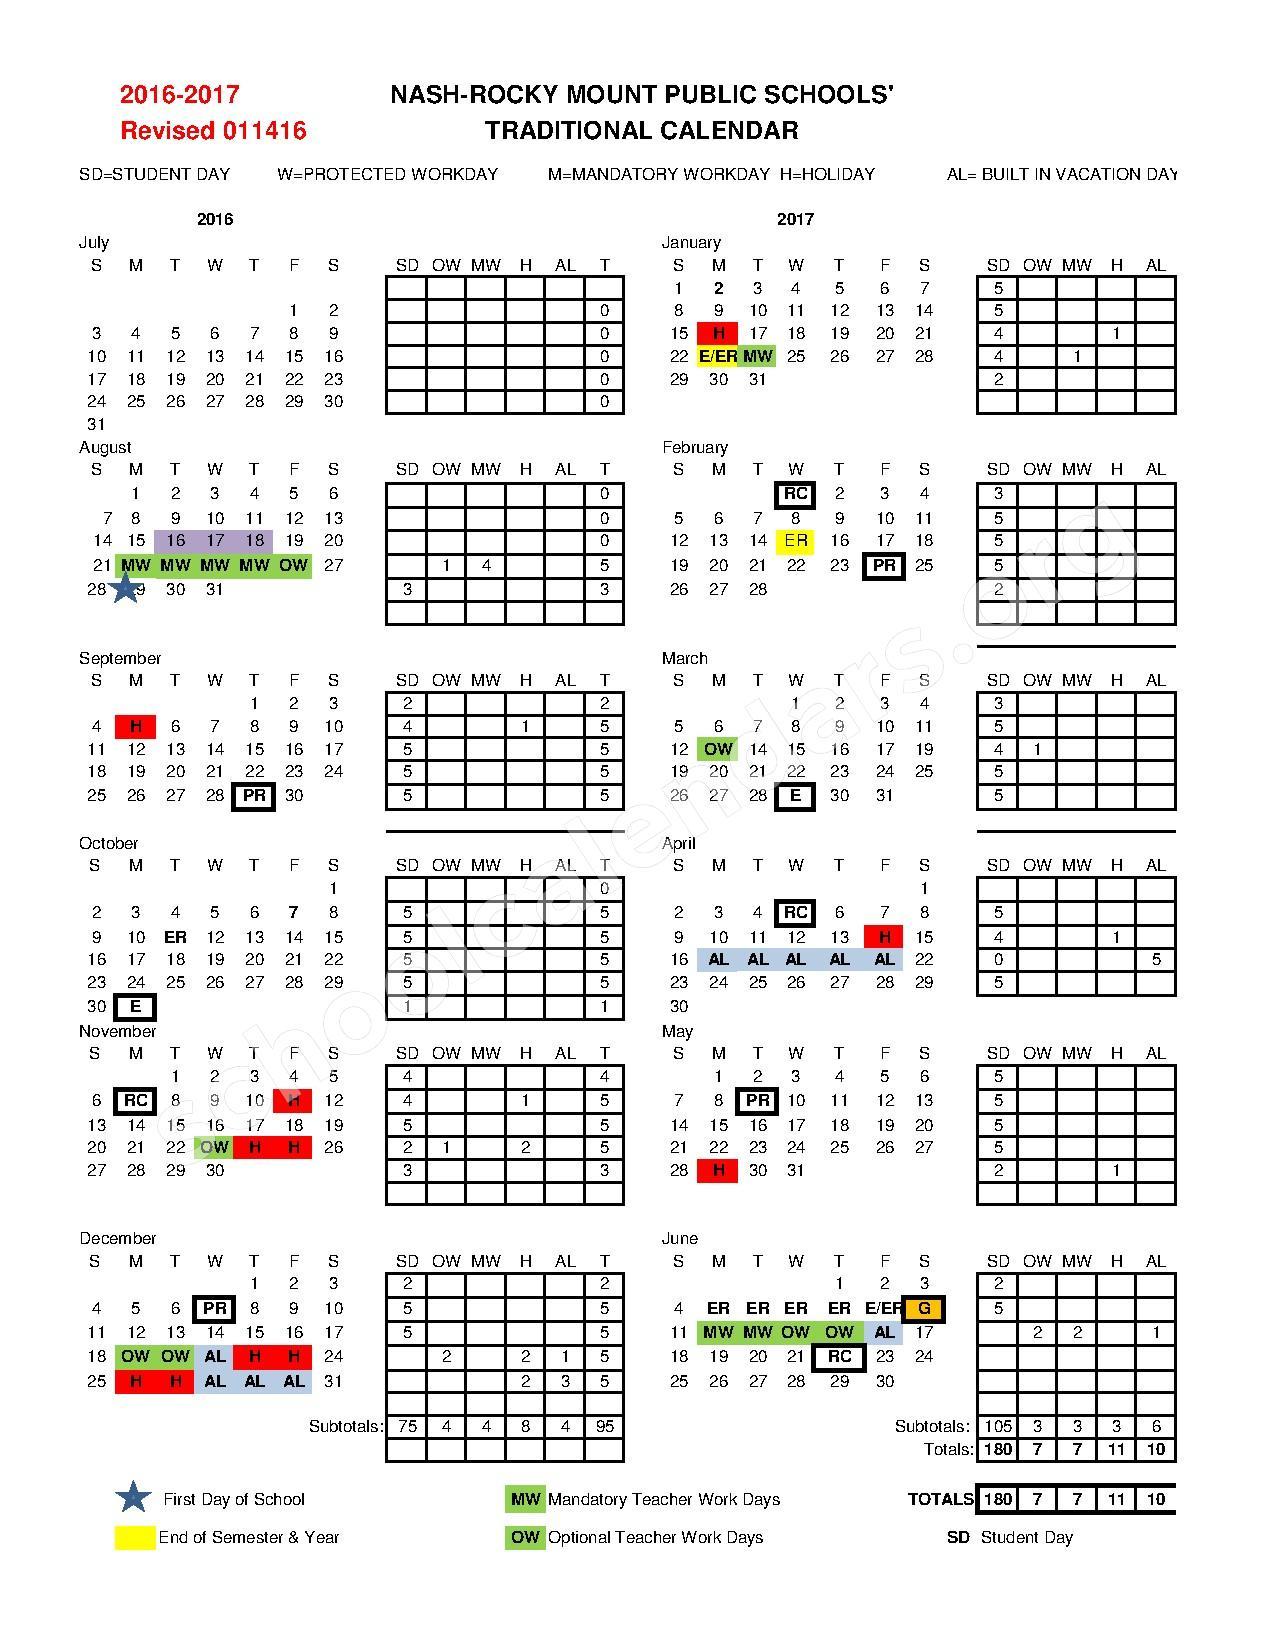 2016 - 2017 School Calendar   Nash-Rocky Mount Public